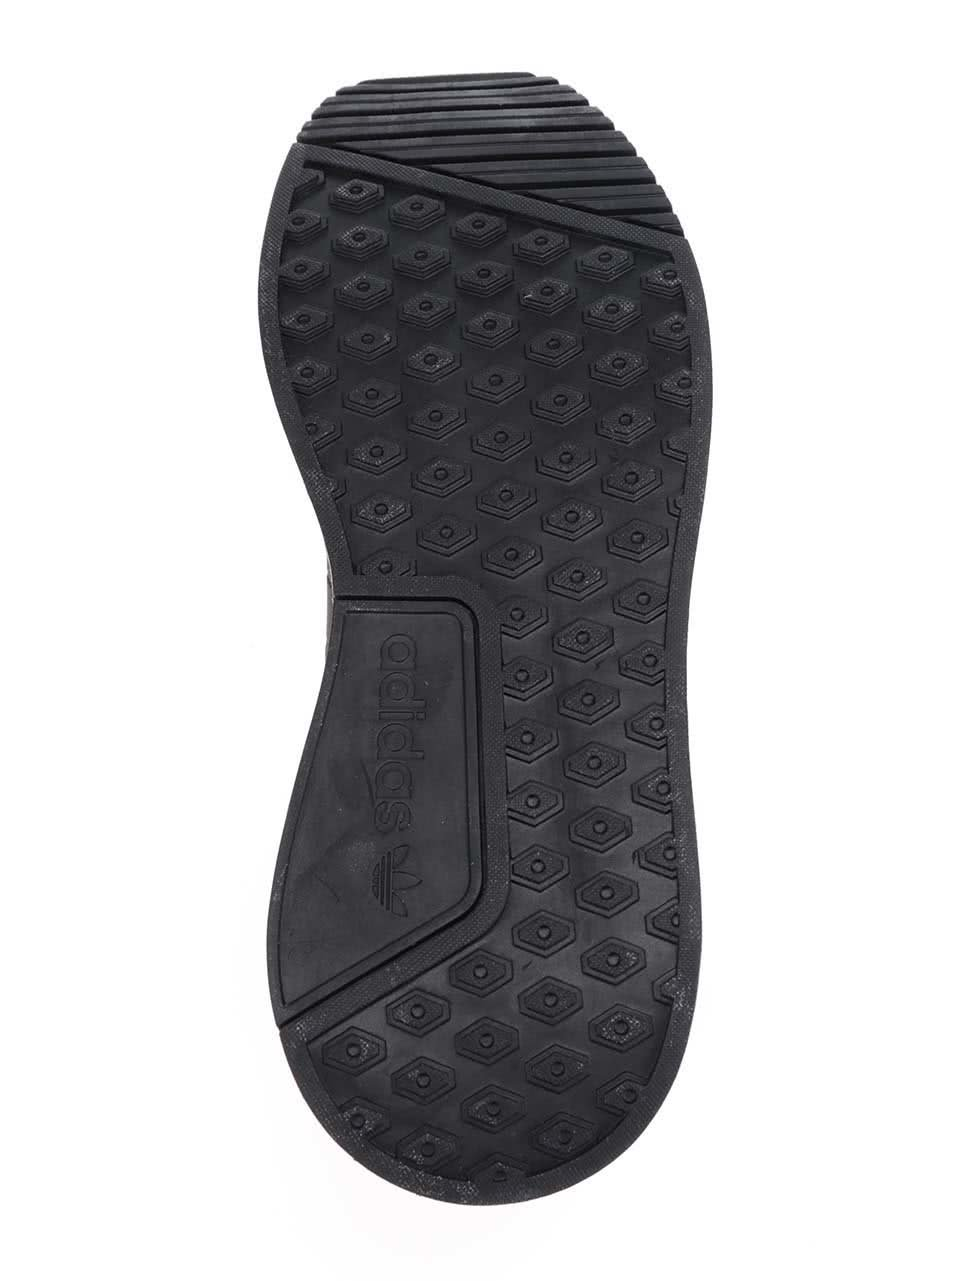 Čierno-červené melírované pánske tenisky adidas Originals X  PLR ... e58336872af